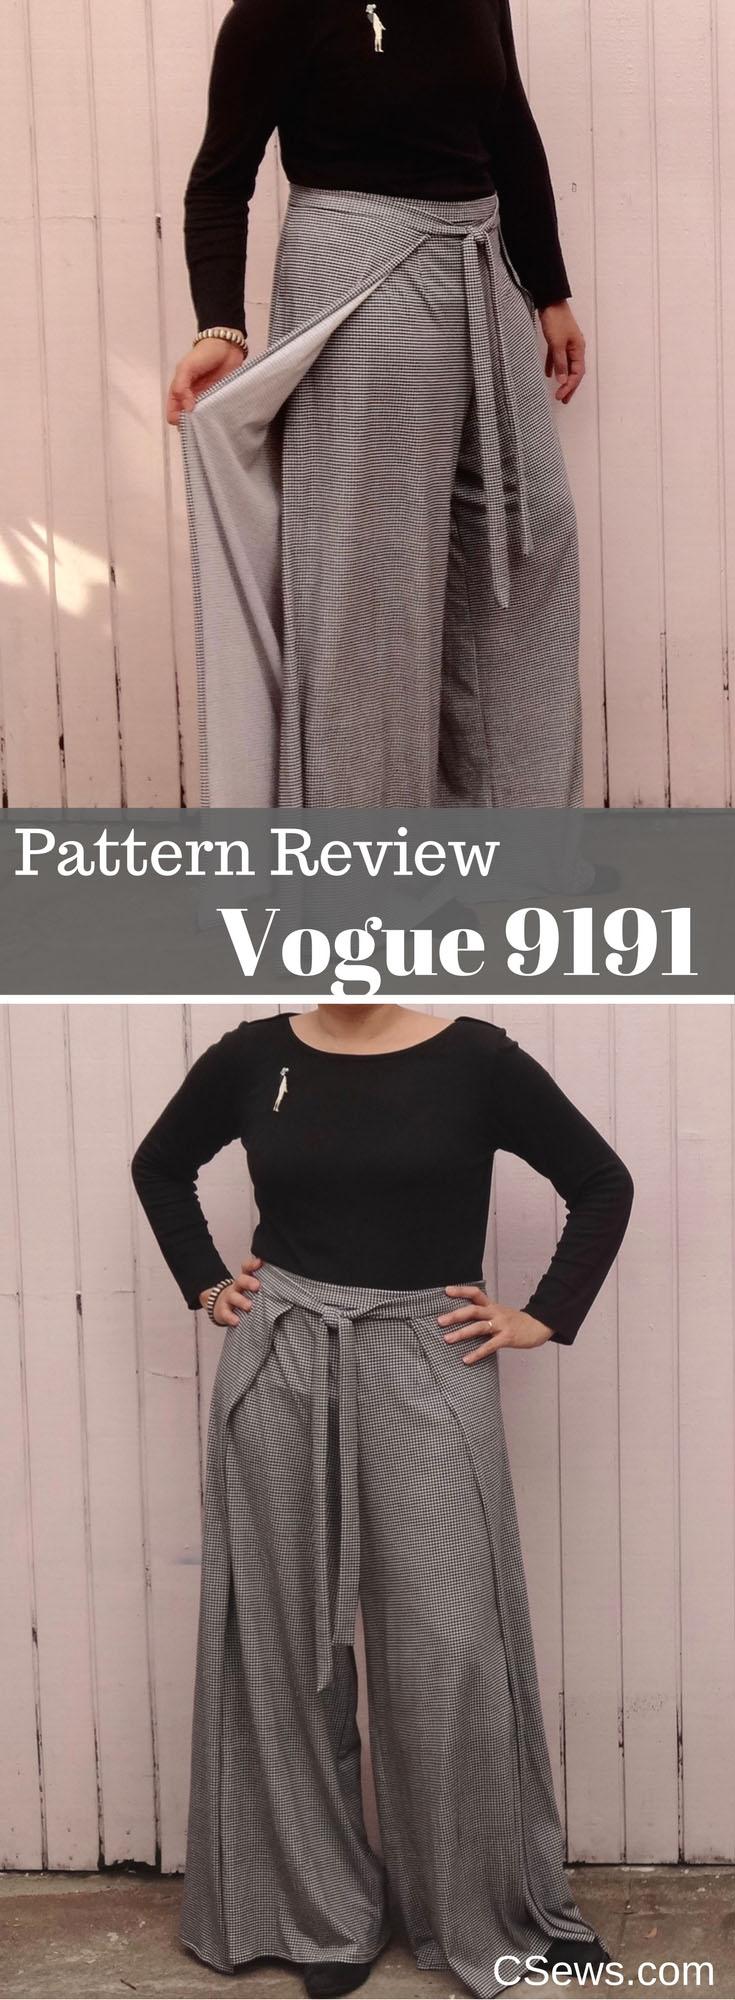 Pattern Review - Vogue 9191 wrap pants V9191